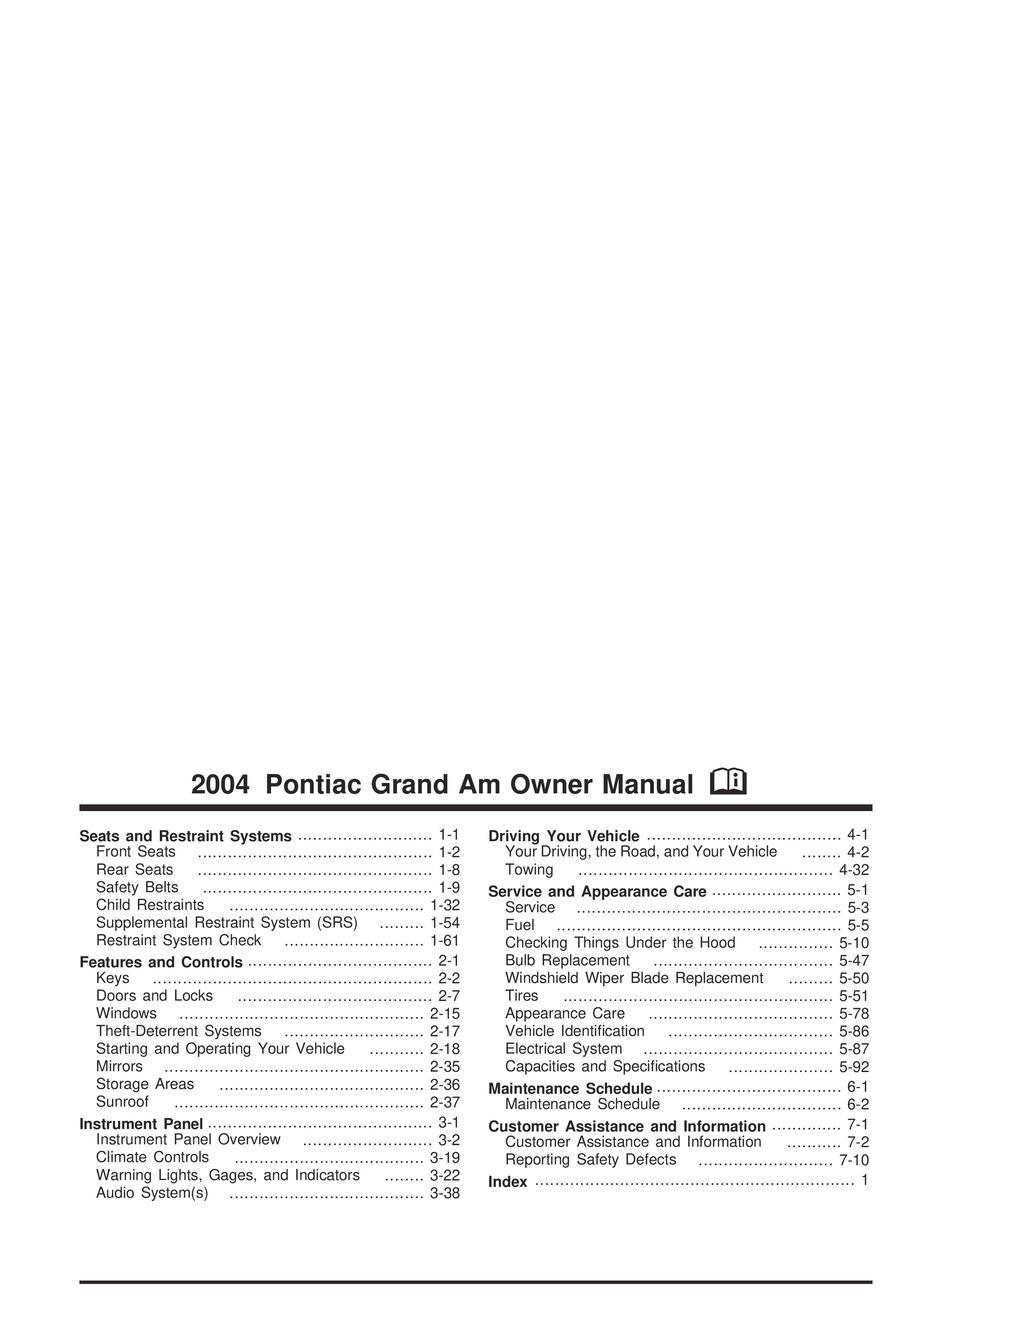 2004 Pontiac Grand Am owners manual